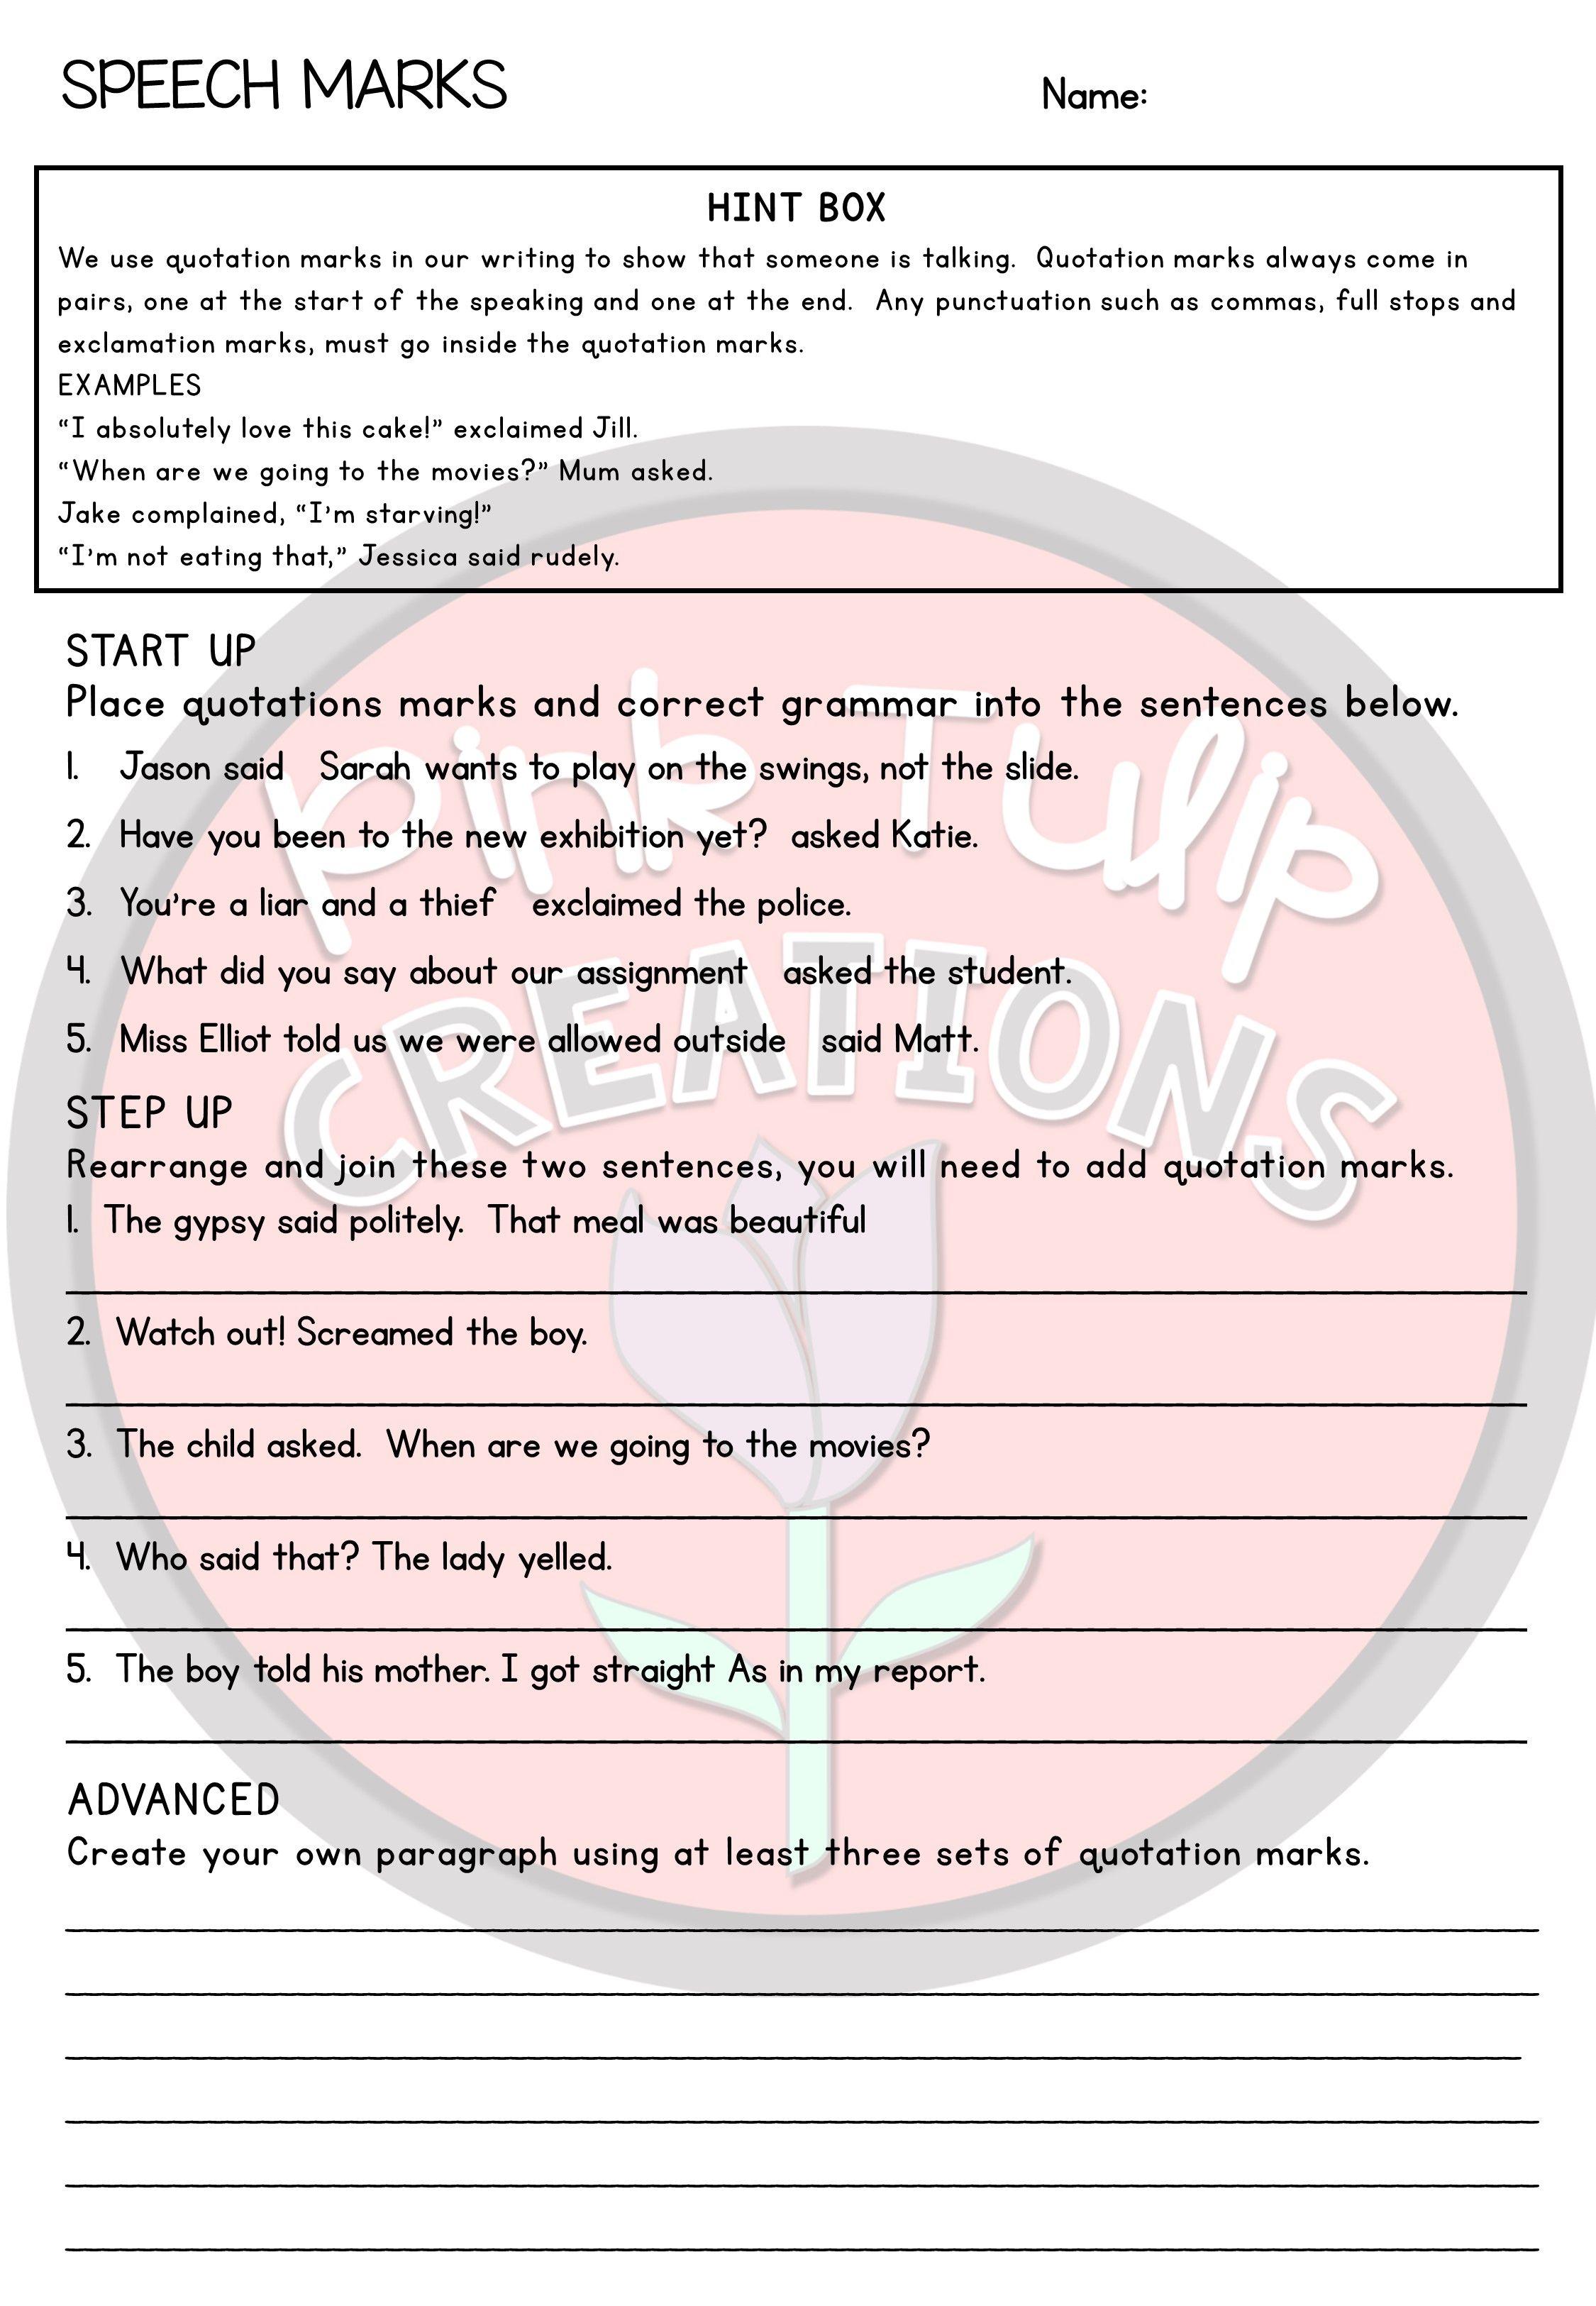 Grammar Worksheet Pack Grammar Worksheets Middle School Writing Activities Quotation Marks